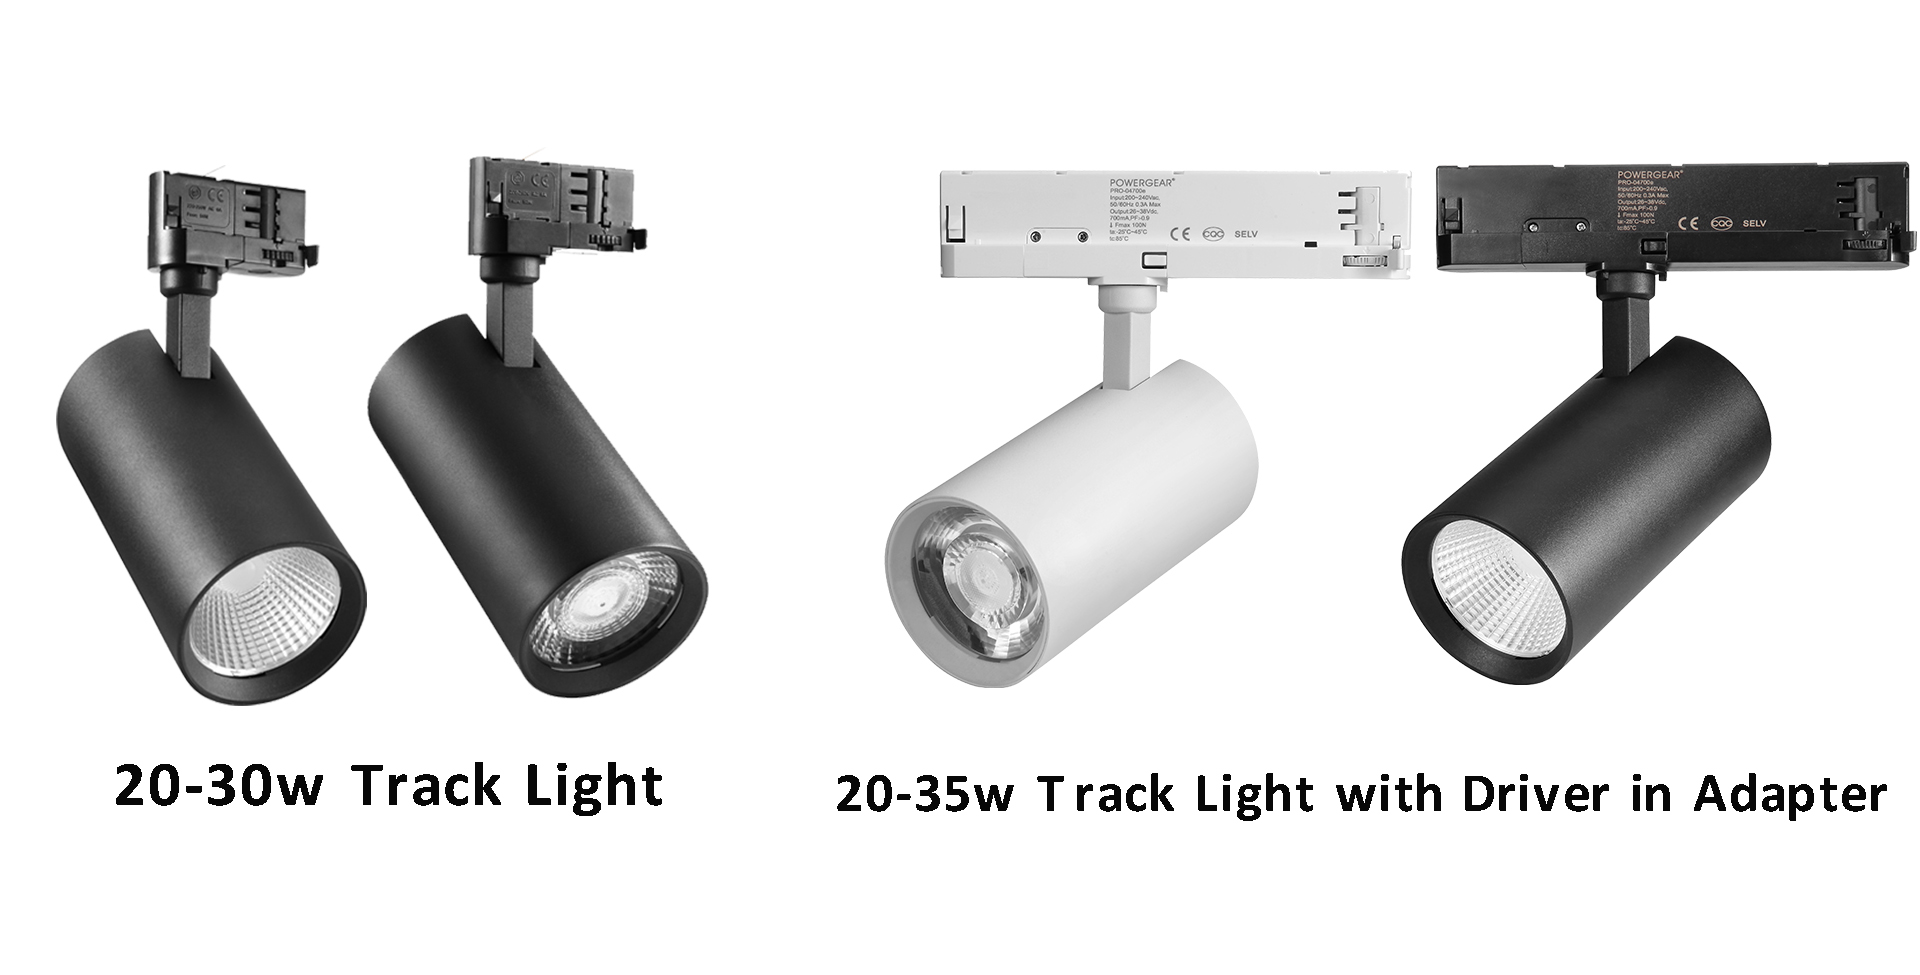 led track lighting, led track fixtures,led track spotlight